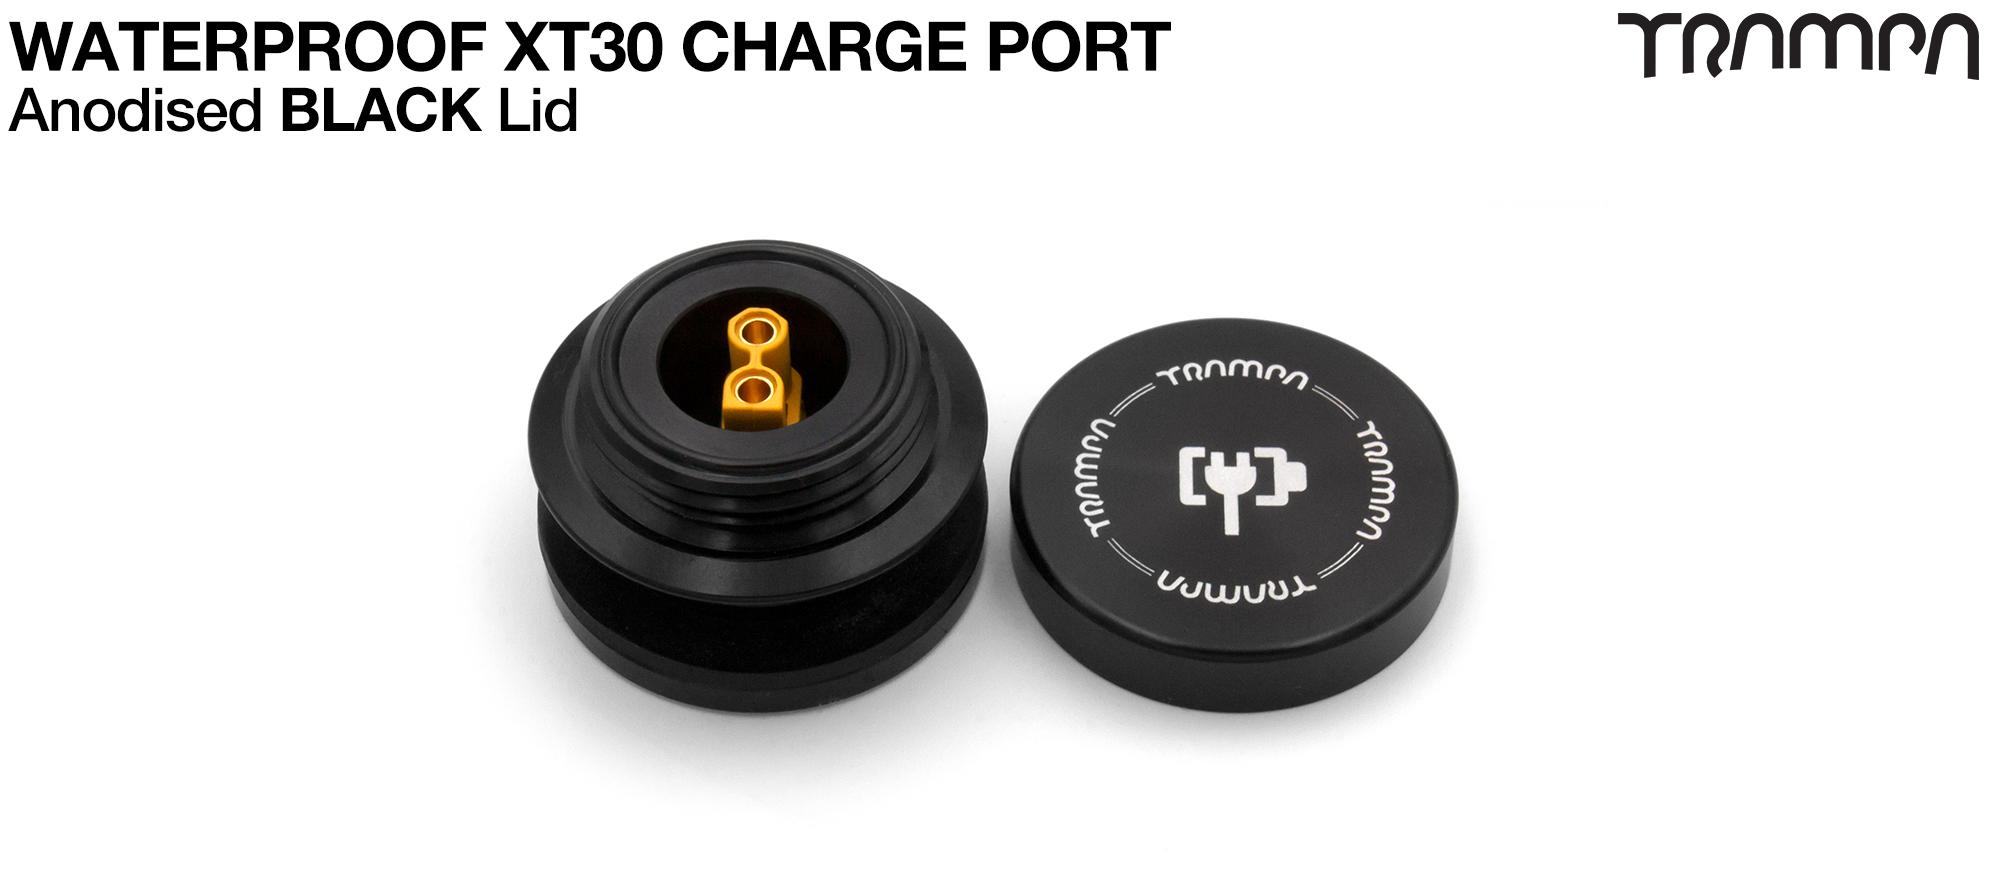 ORRSOM GT XT30 WATERPROOF Charge Port - BLACK